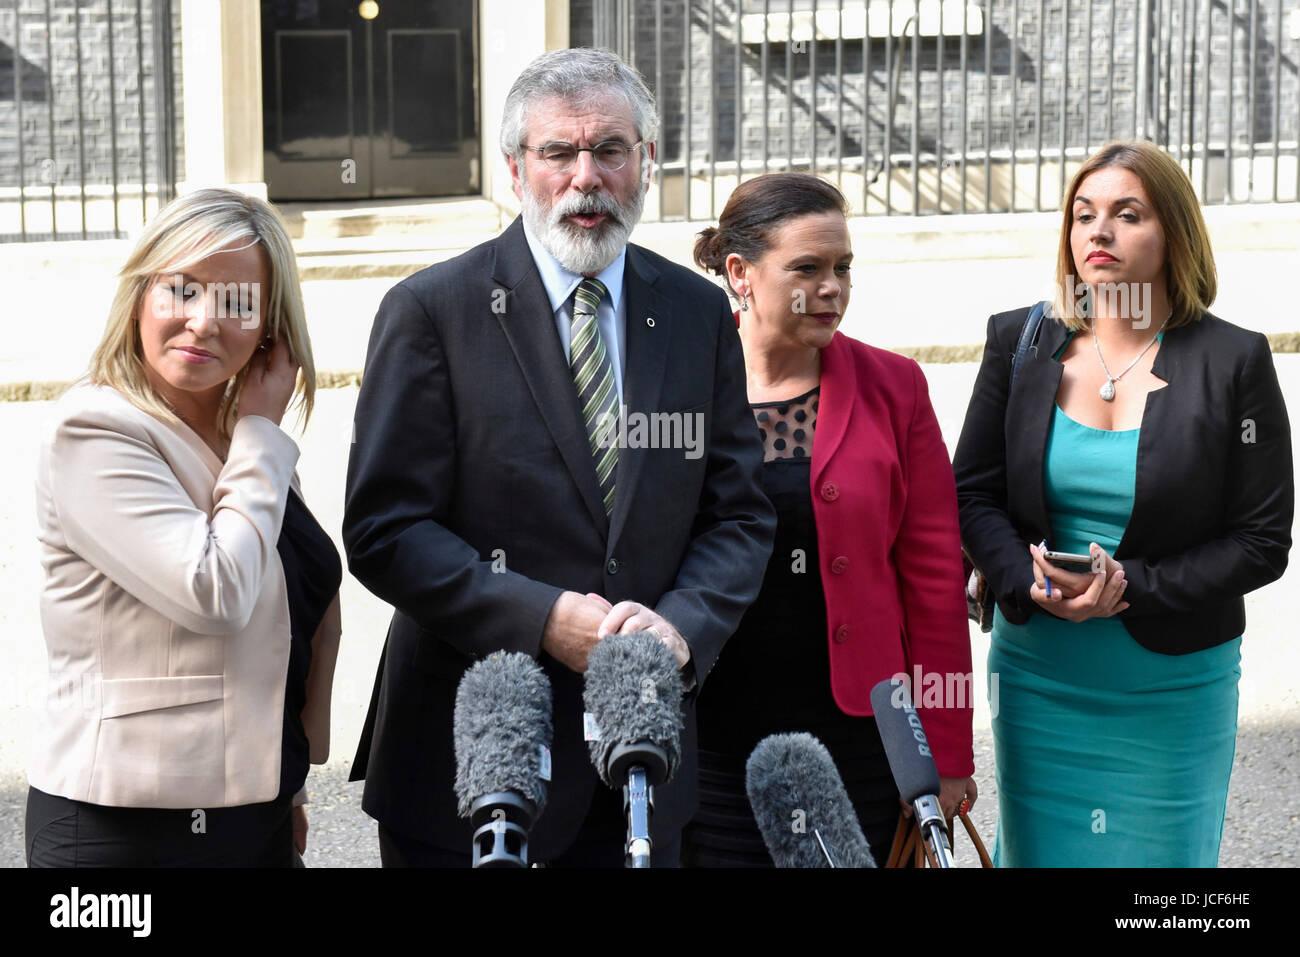 London, UK. 15th June, 2017. (L to R) Michelle O'Neill, leader of Sinn Féin, Gerry Adams, President, Mary - Stock Image